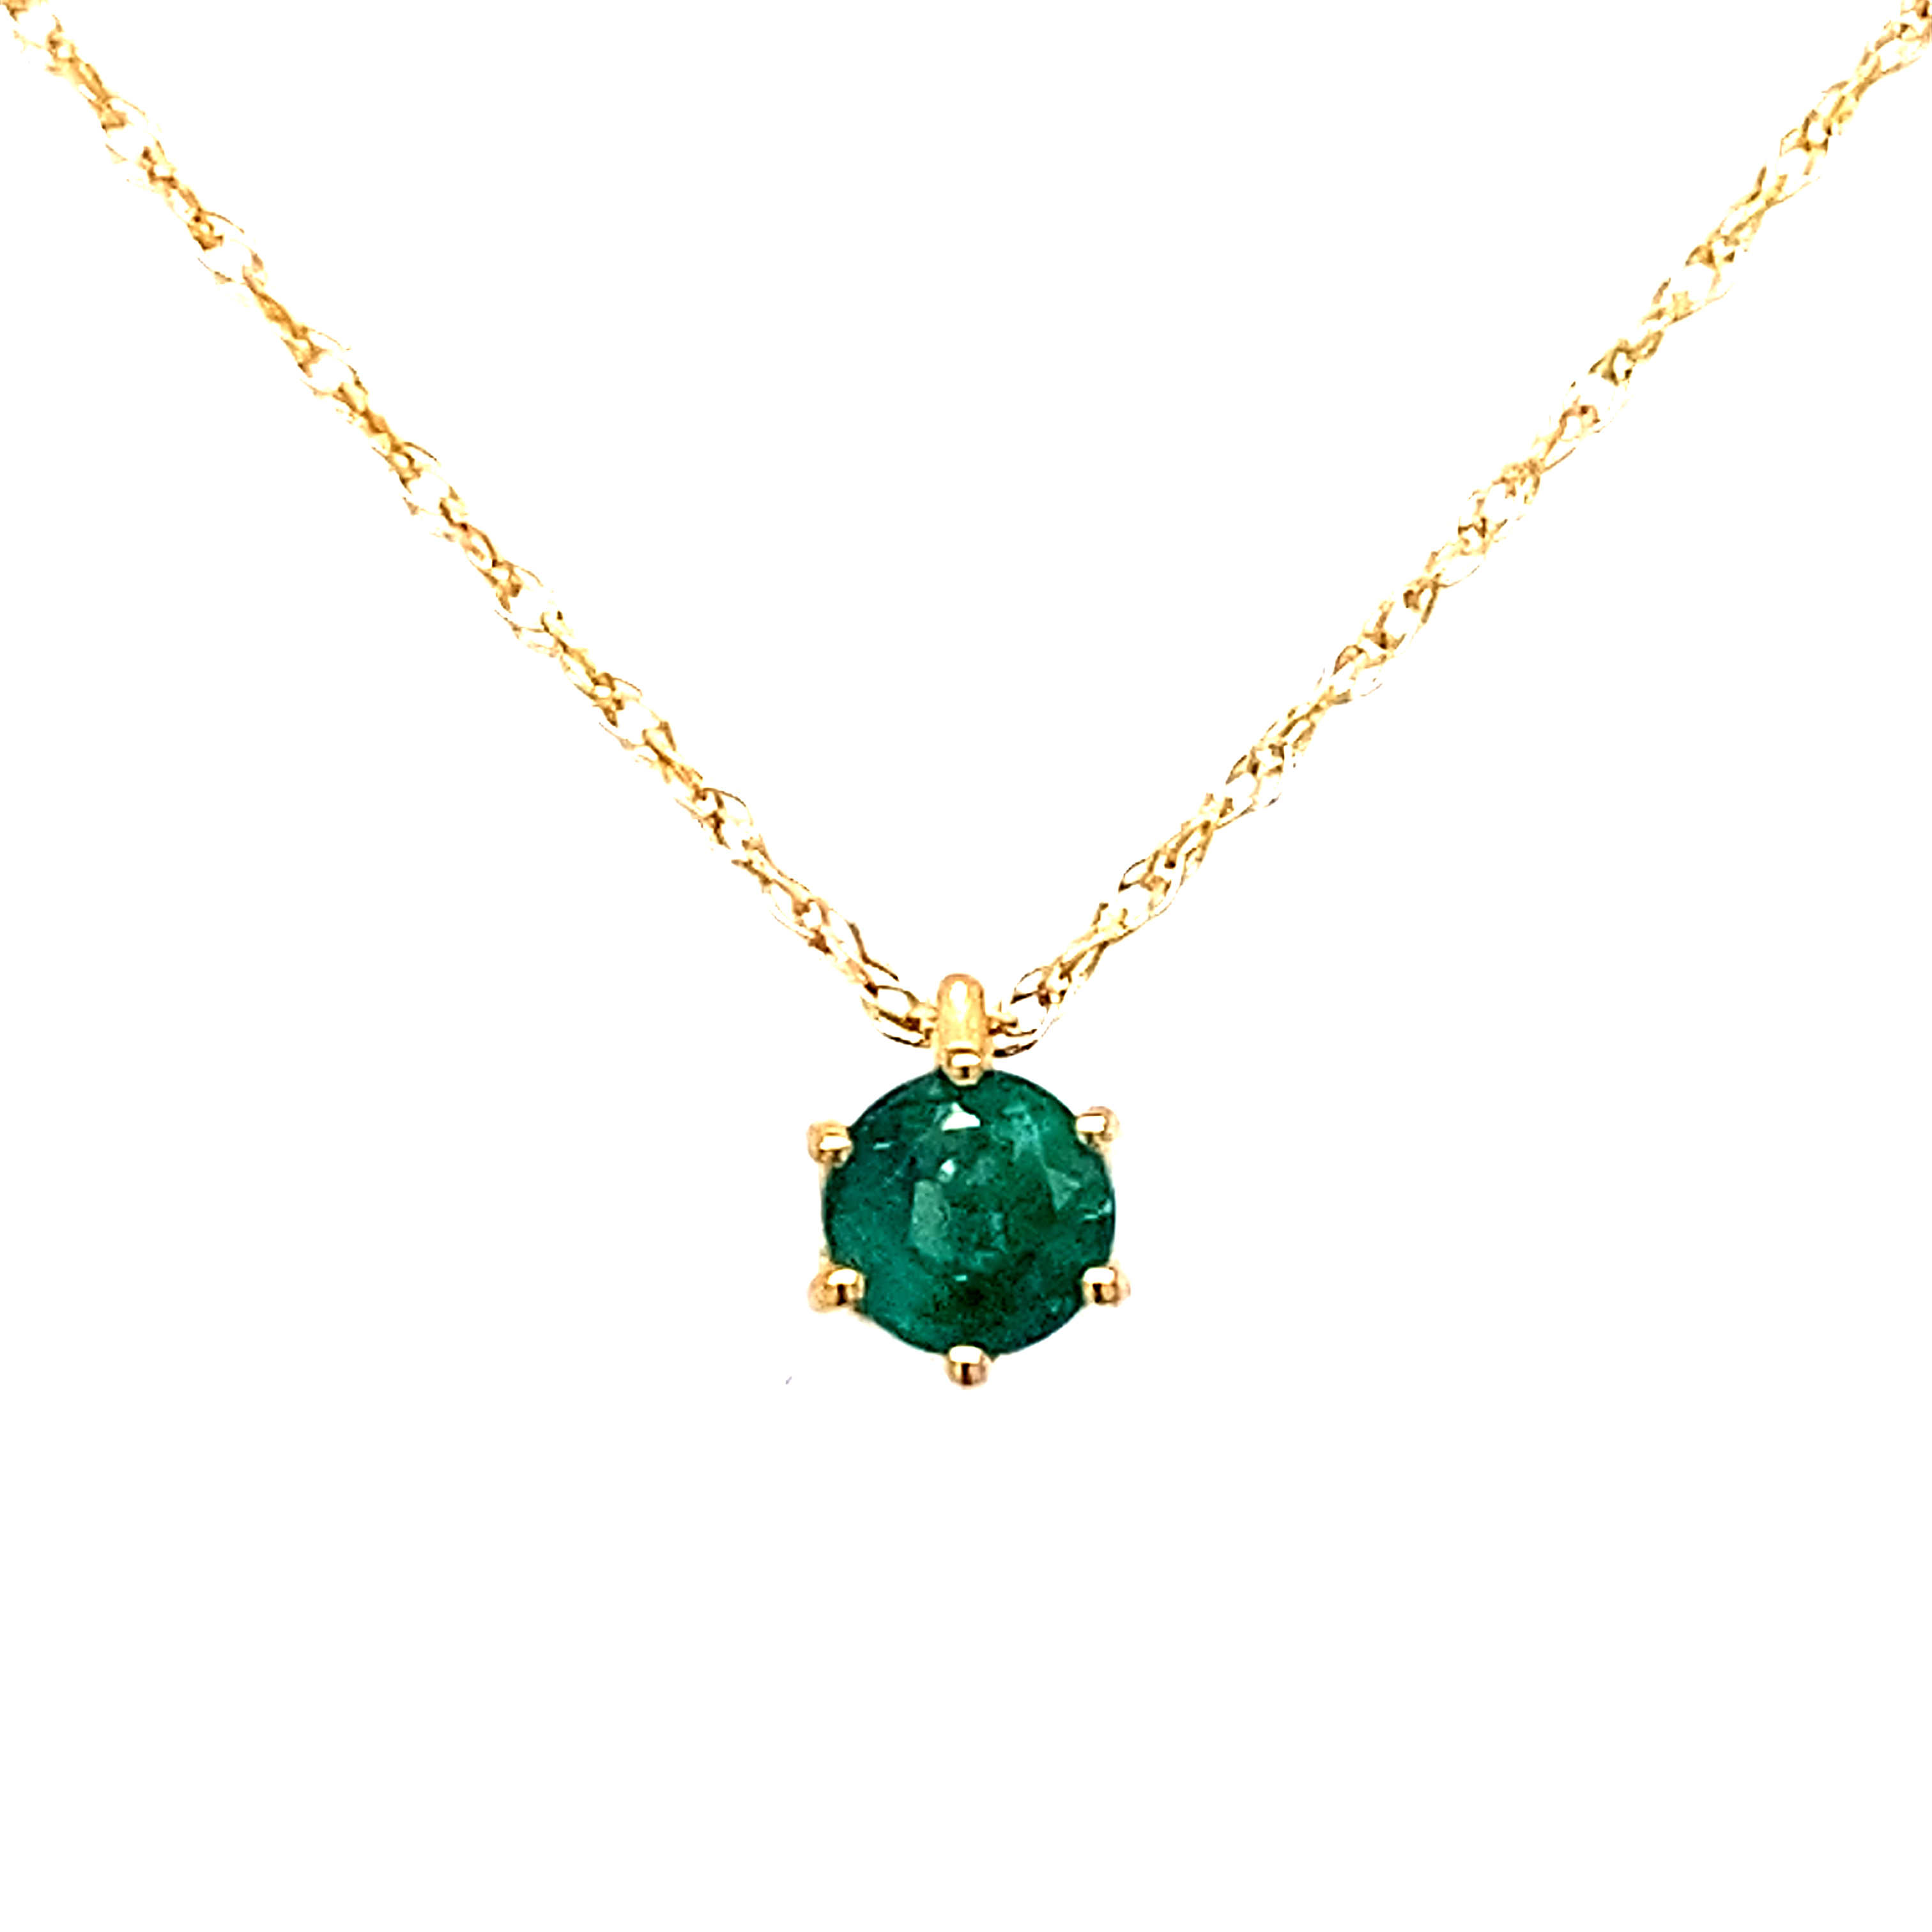 9 Carat Yellow Gold Emerald Pendant